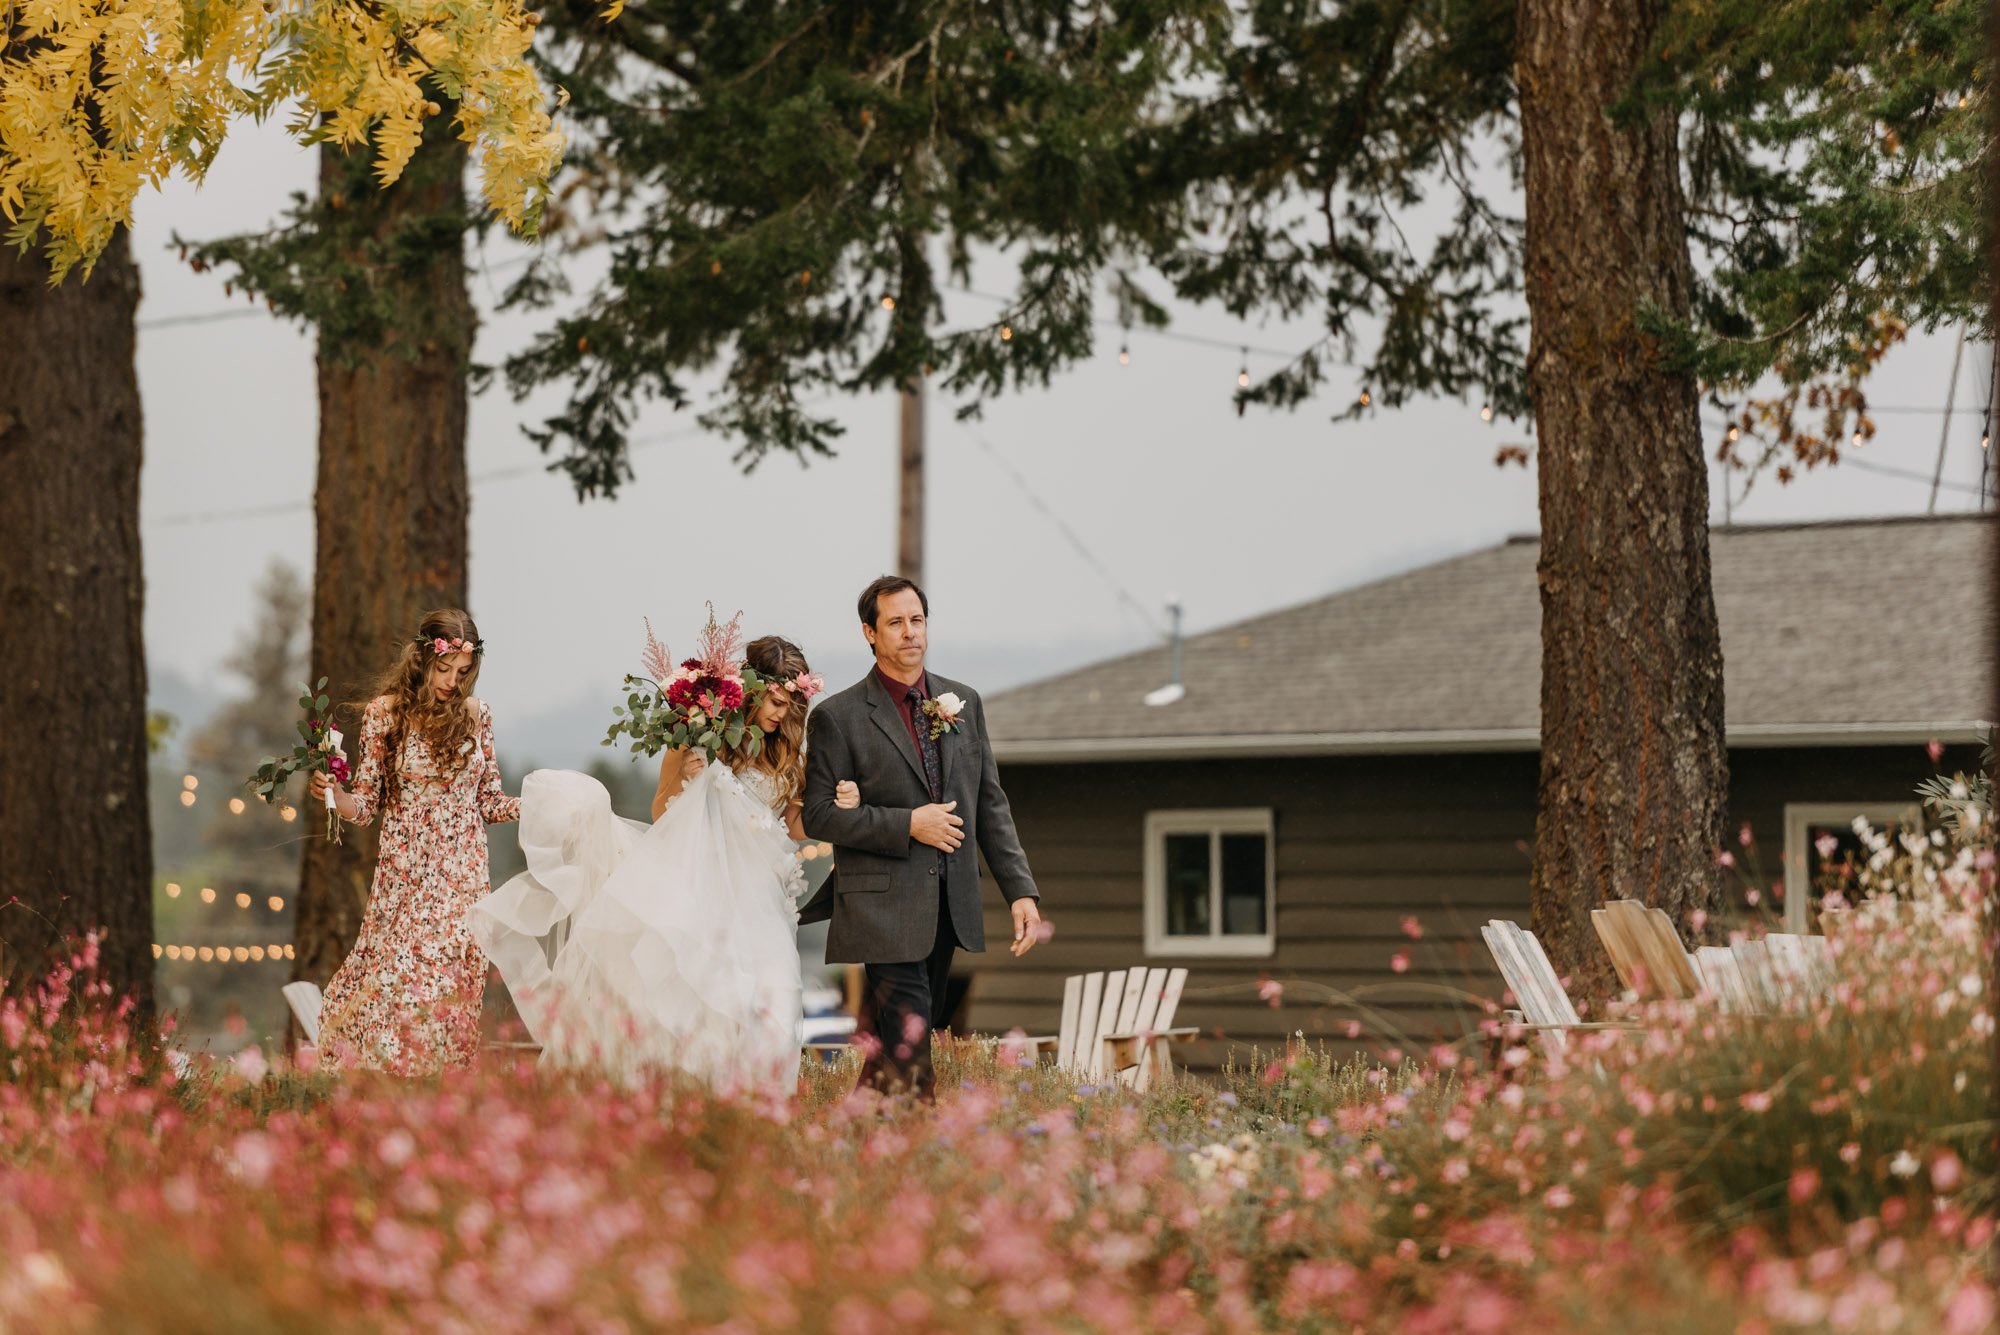 Outdoor-Summer-Ceremony-Washington-Wedding-Rainbow-8829.jpg